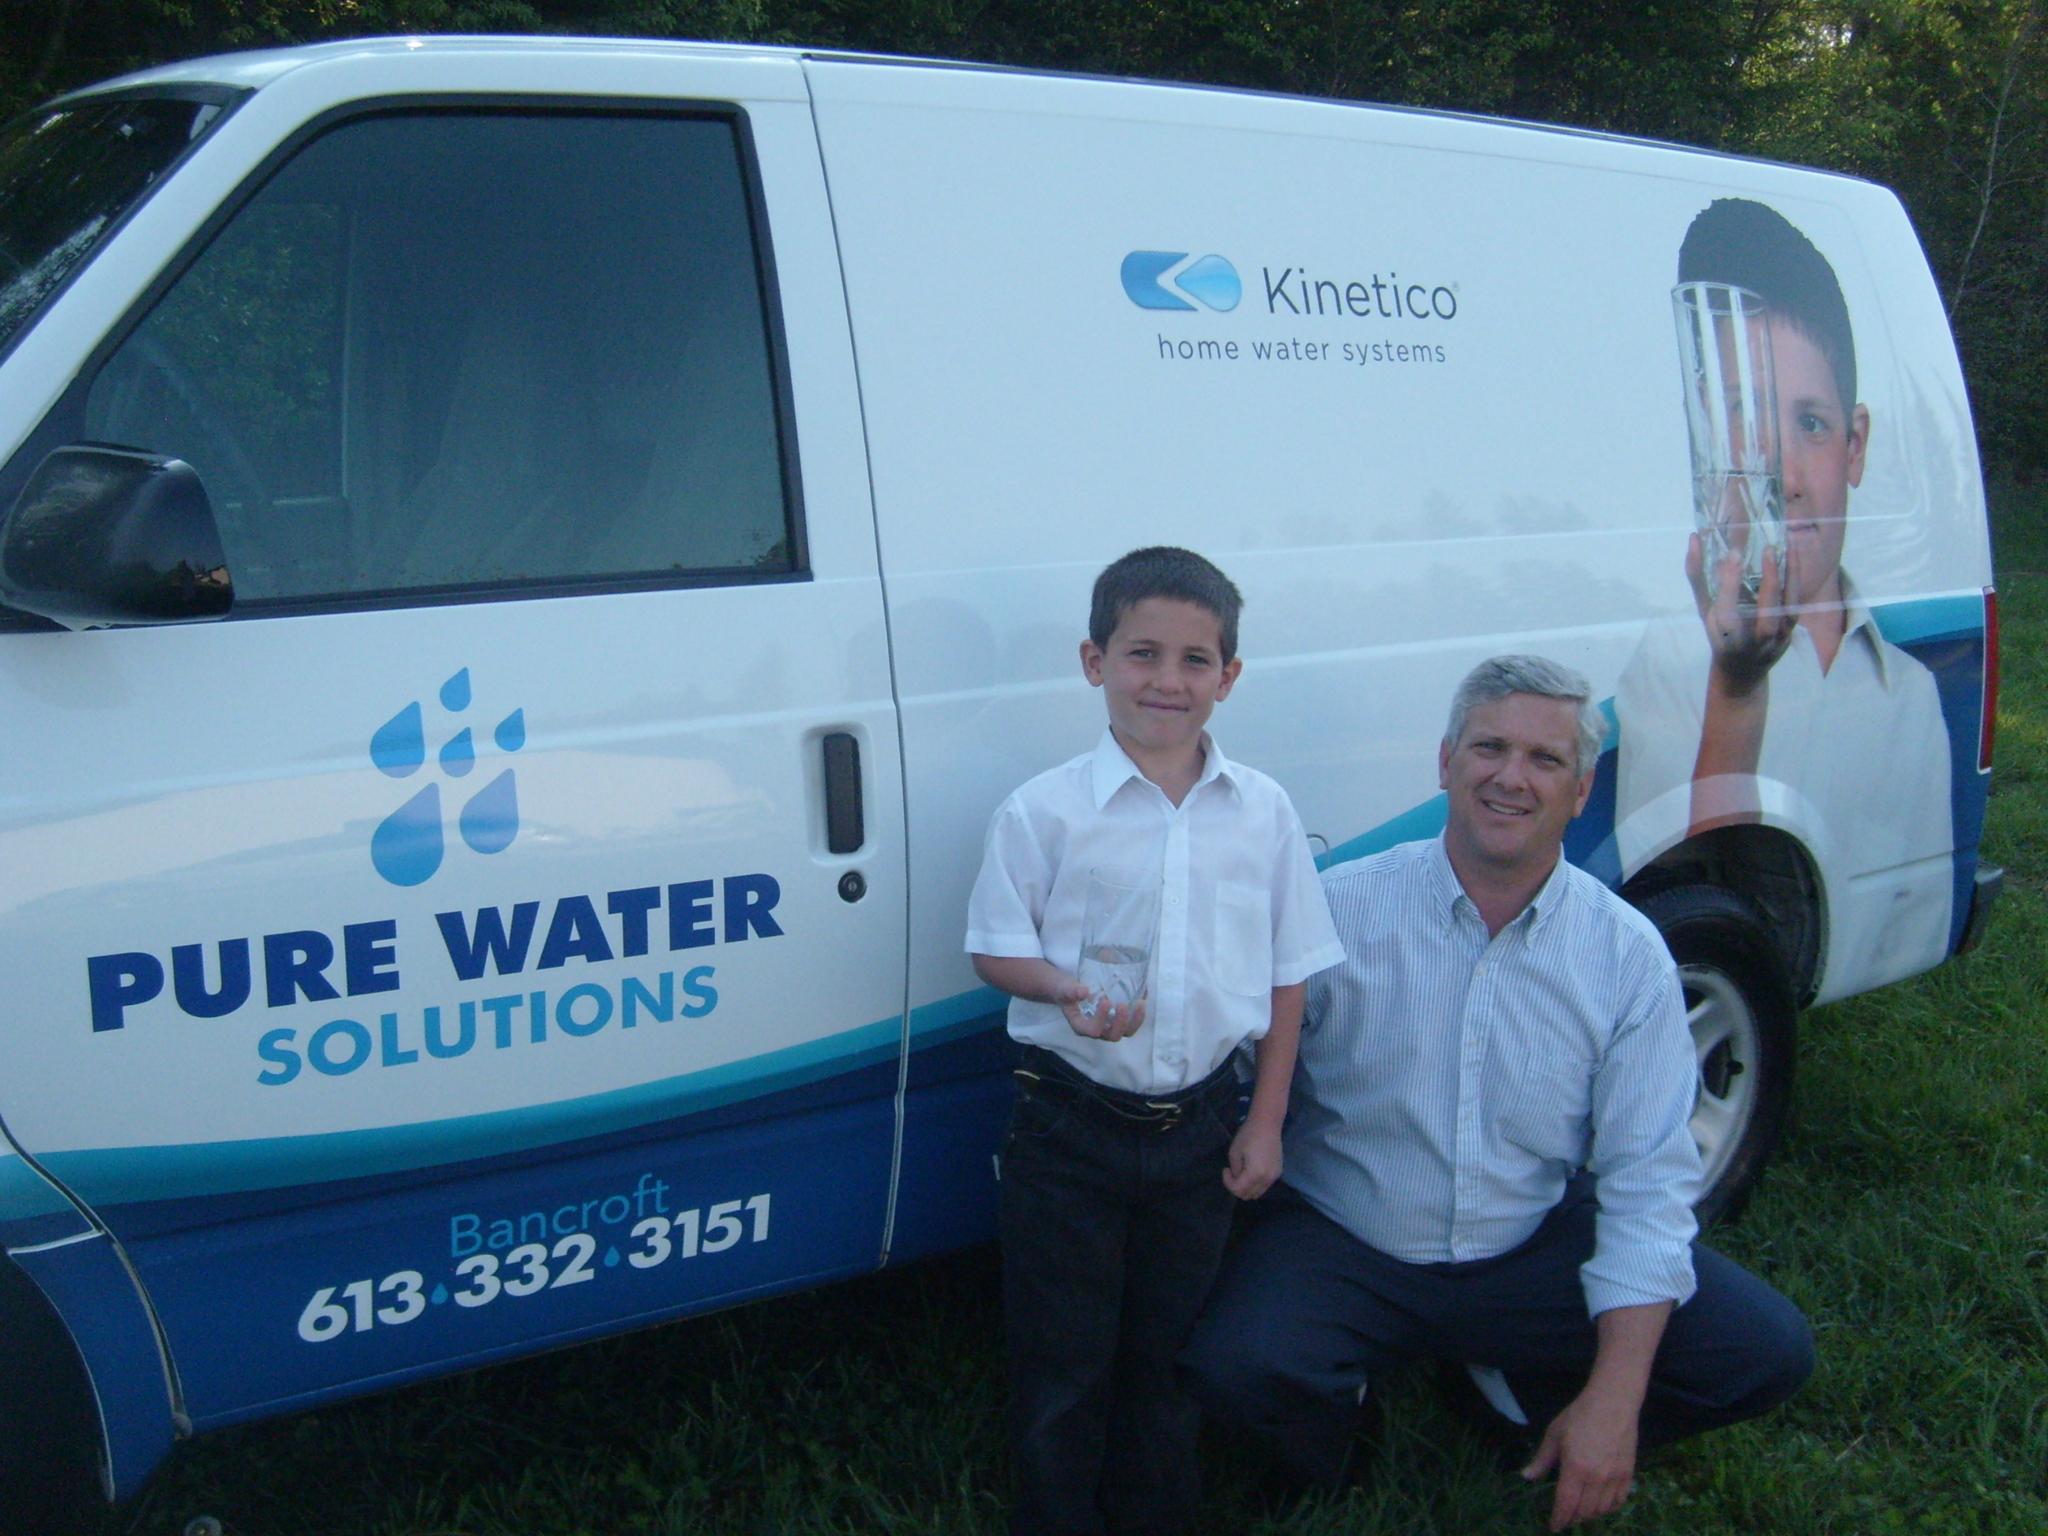 Pure Water Solutions à Bancroft